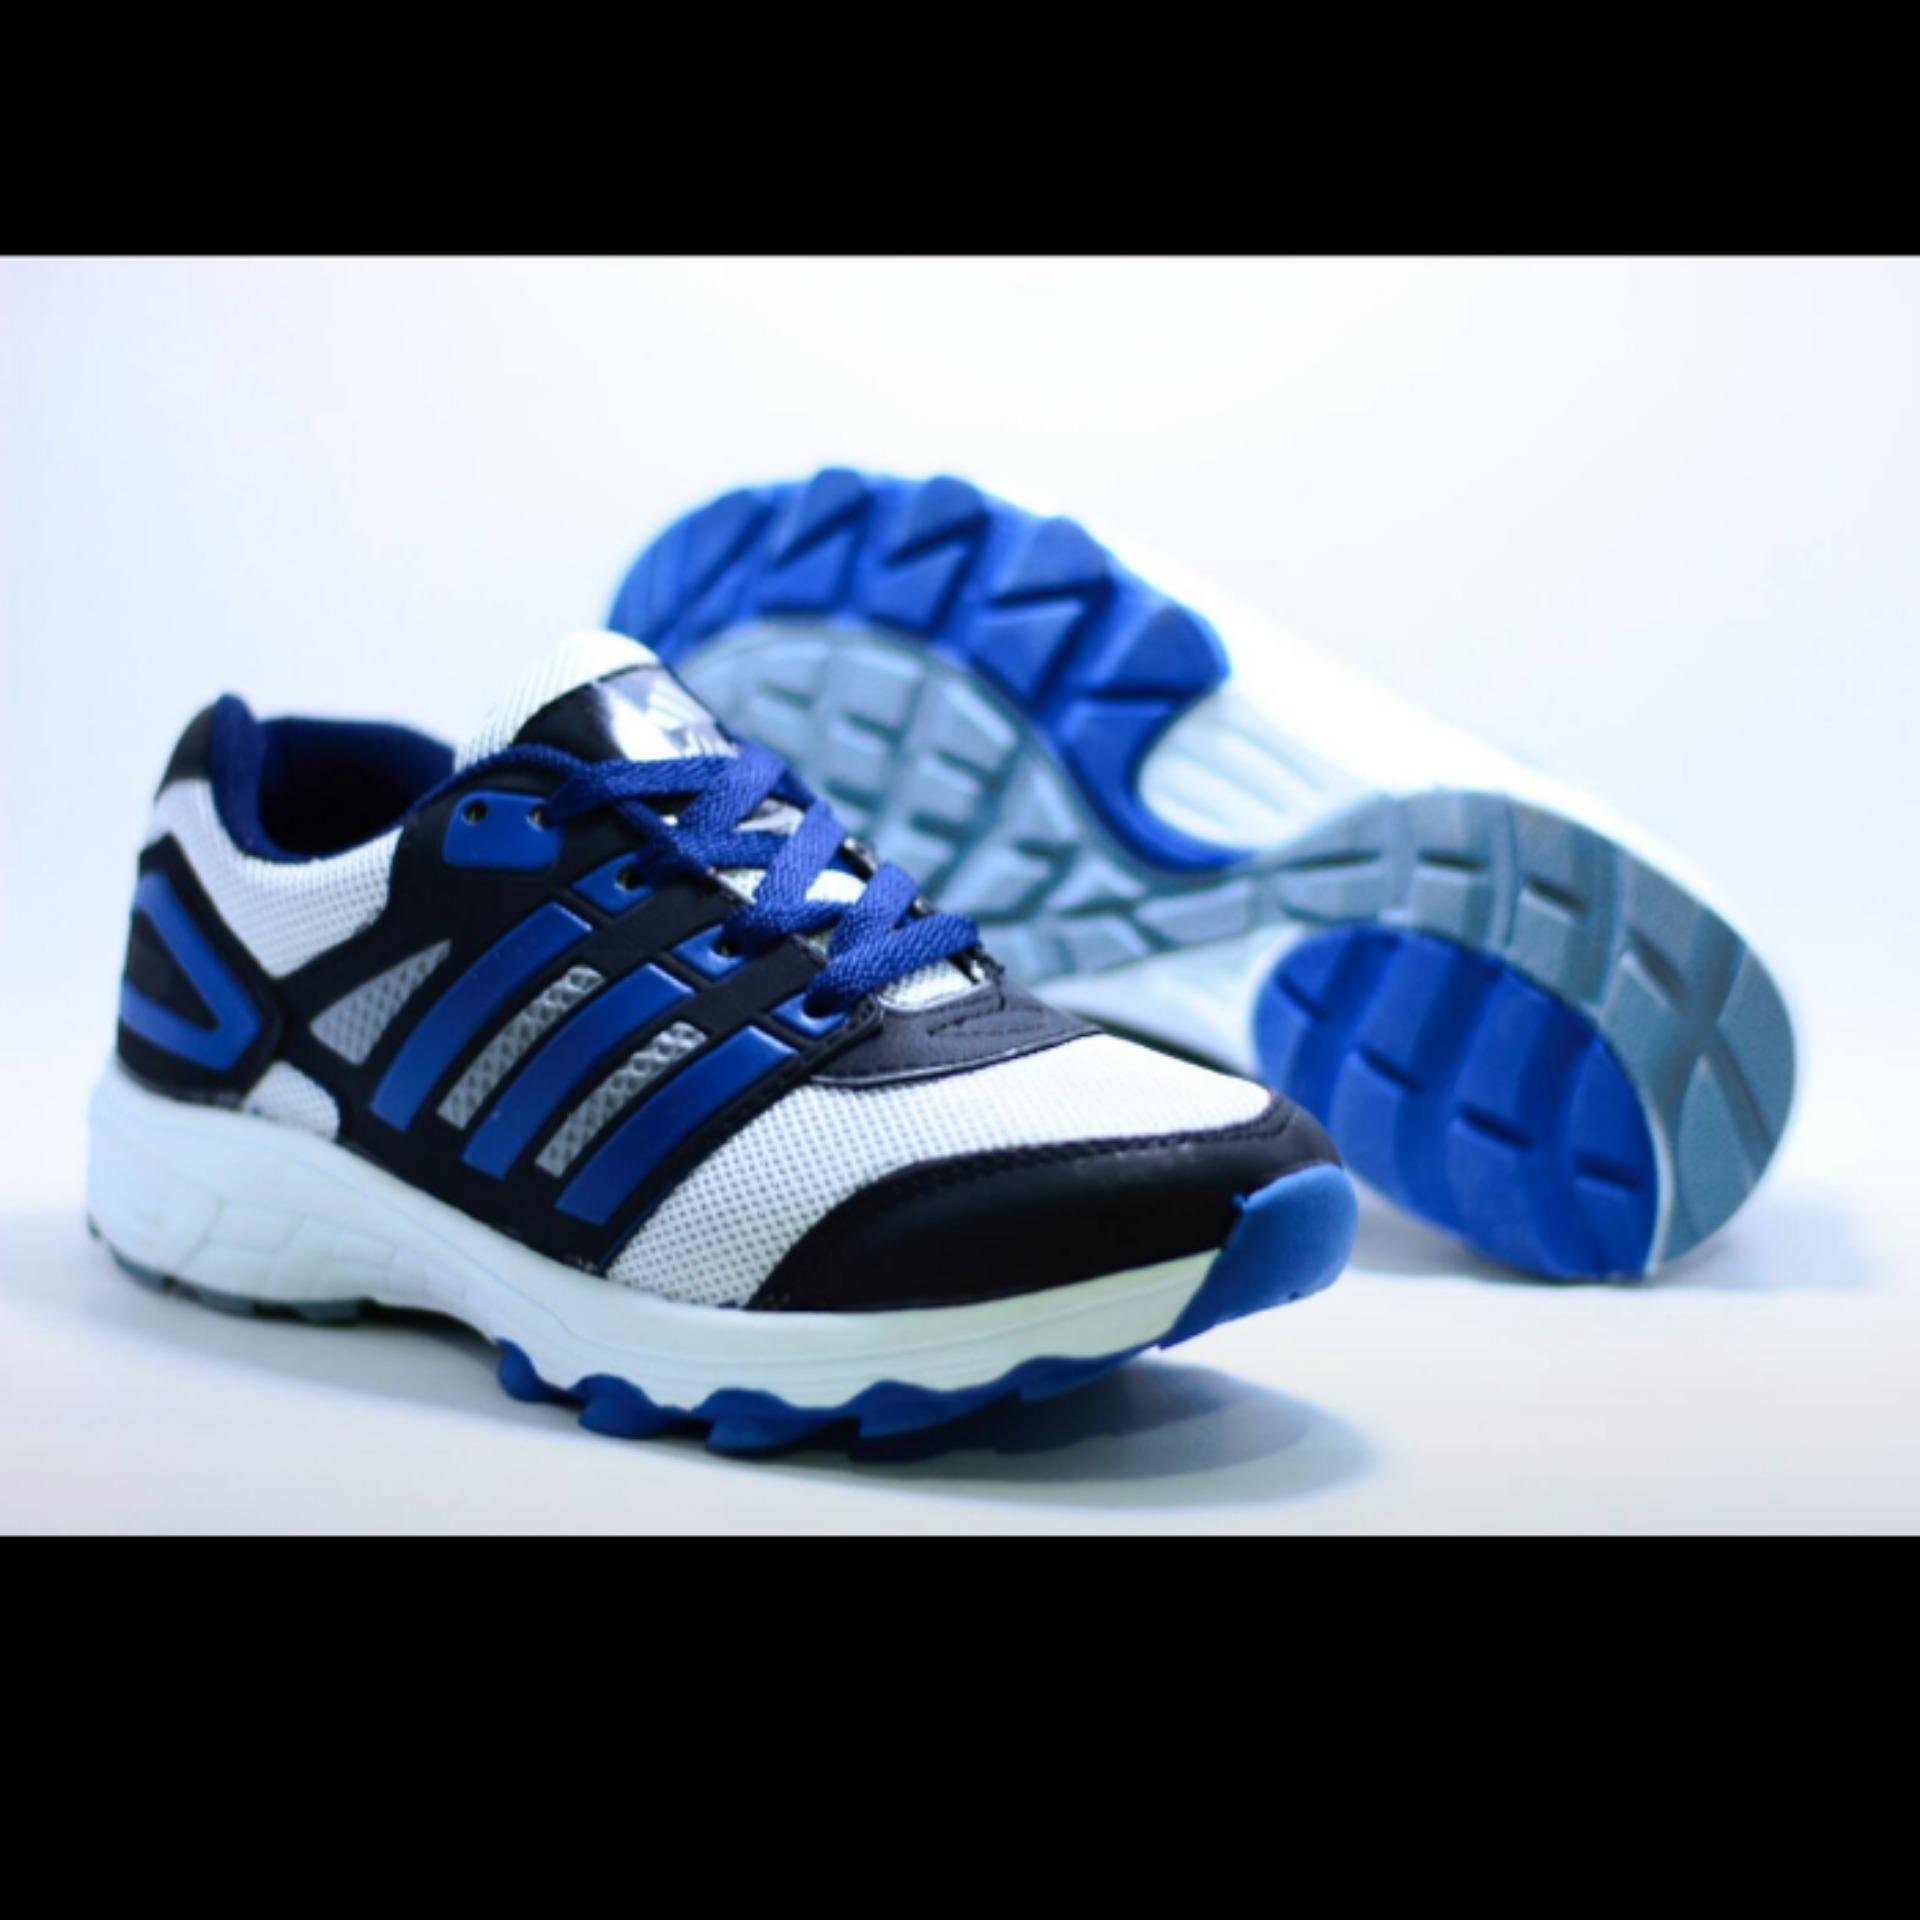 2d63a1a2cb49 Bavy Shoes Sepatu Sport Pria Adinova Neo Sepatu Sneaker Pria Adinova  Sepatu  Olahraga